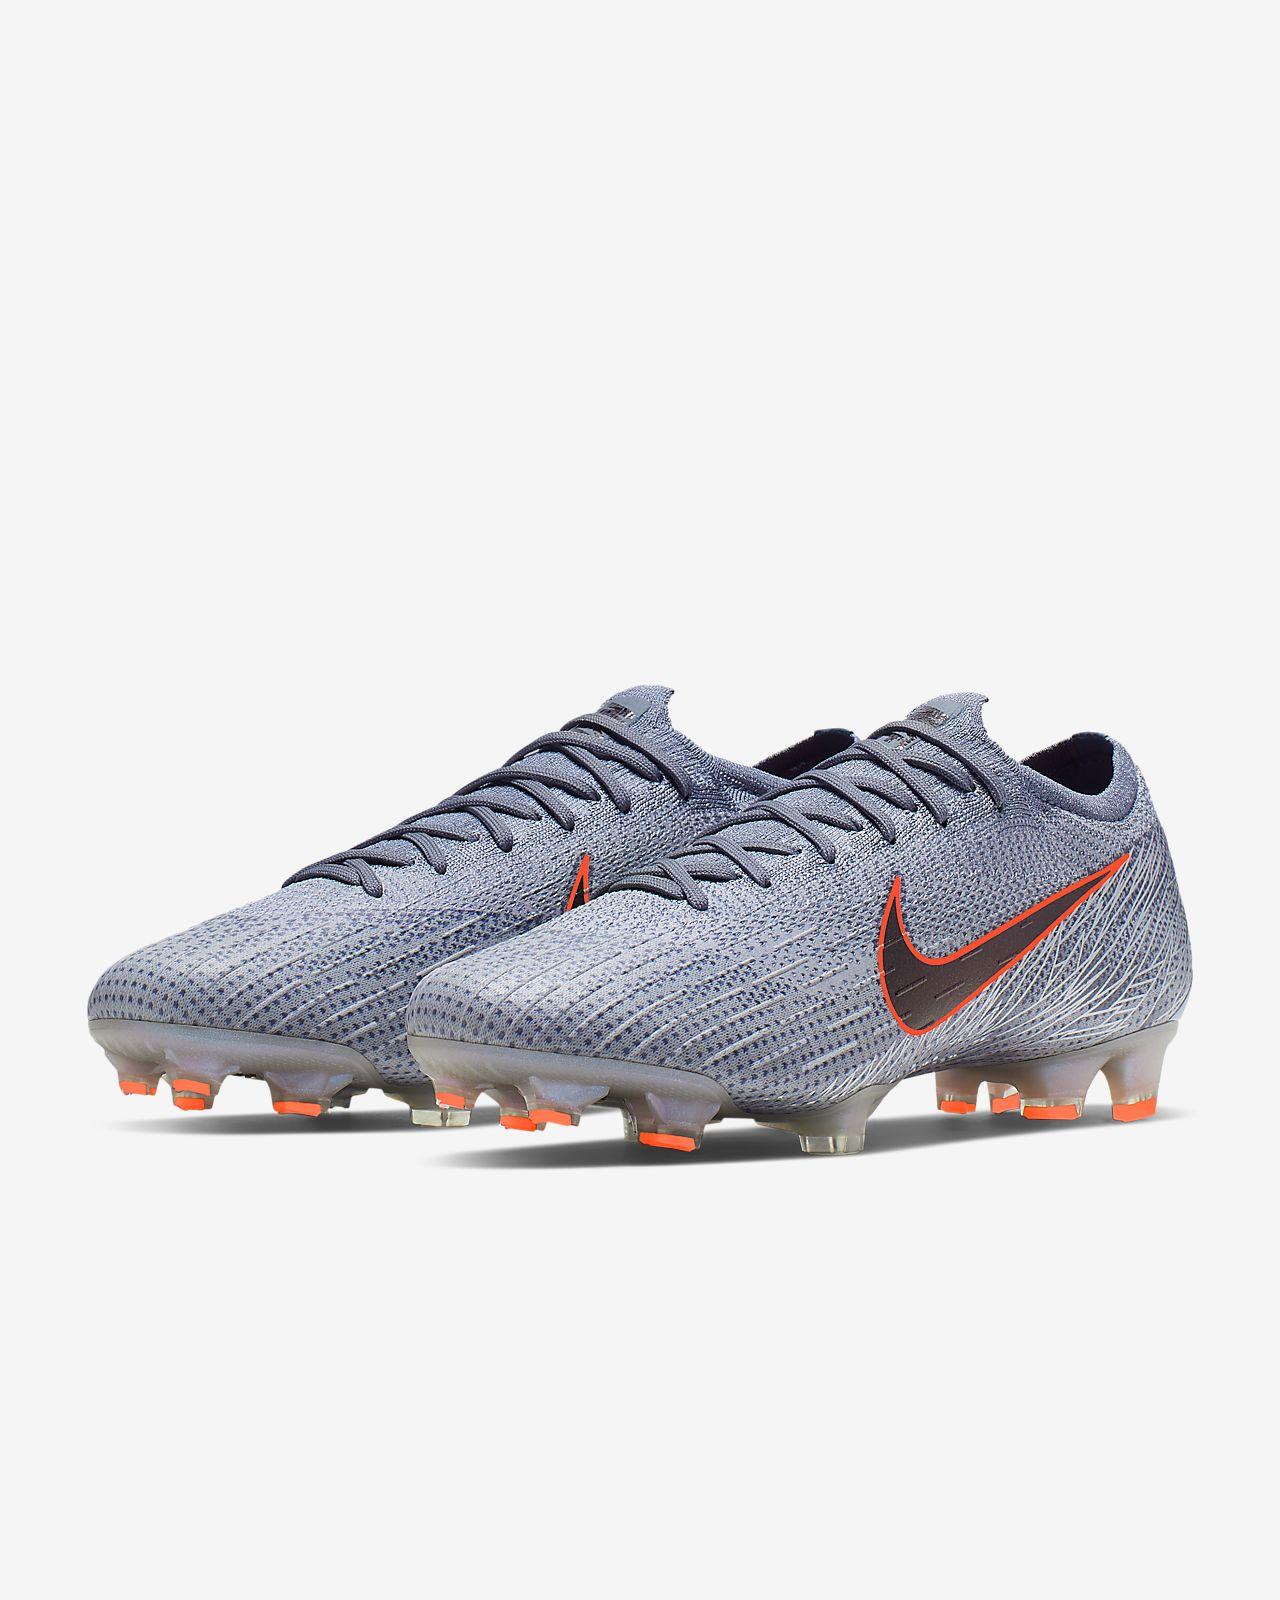 sports shoes 1ddda c048b ... Nike Vapor 12 Elite FG Firm-Ground Soccer Cleat